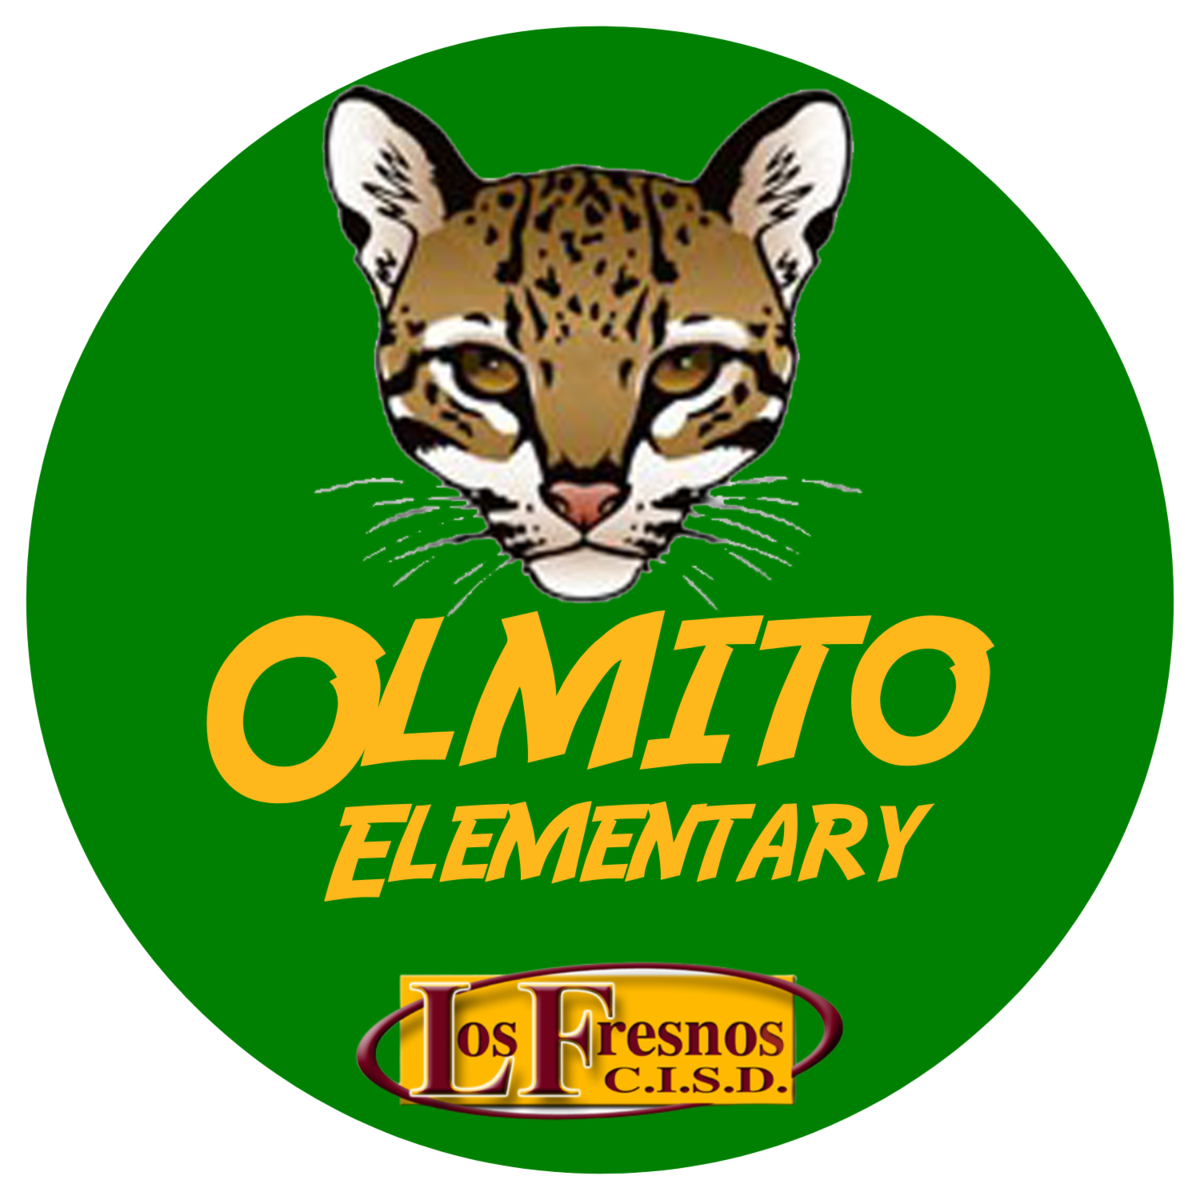 Olmito Elementary School logo